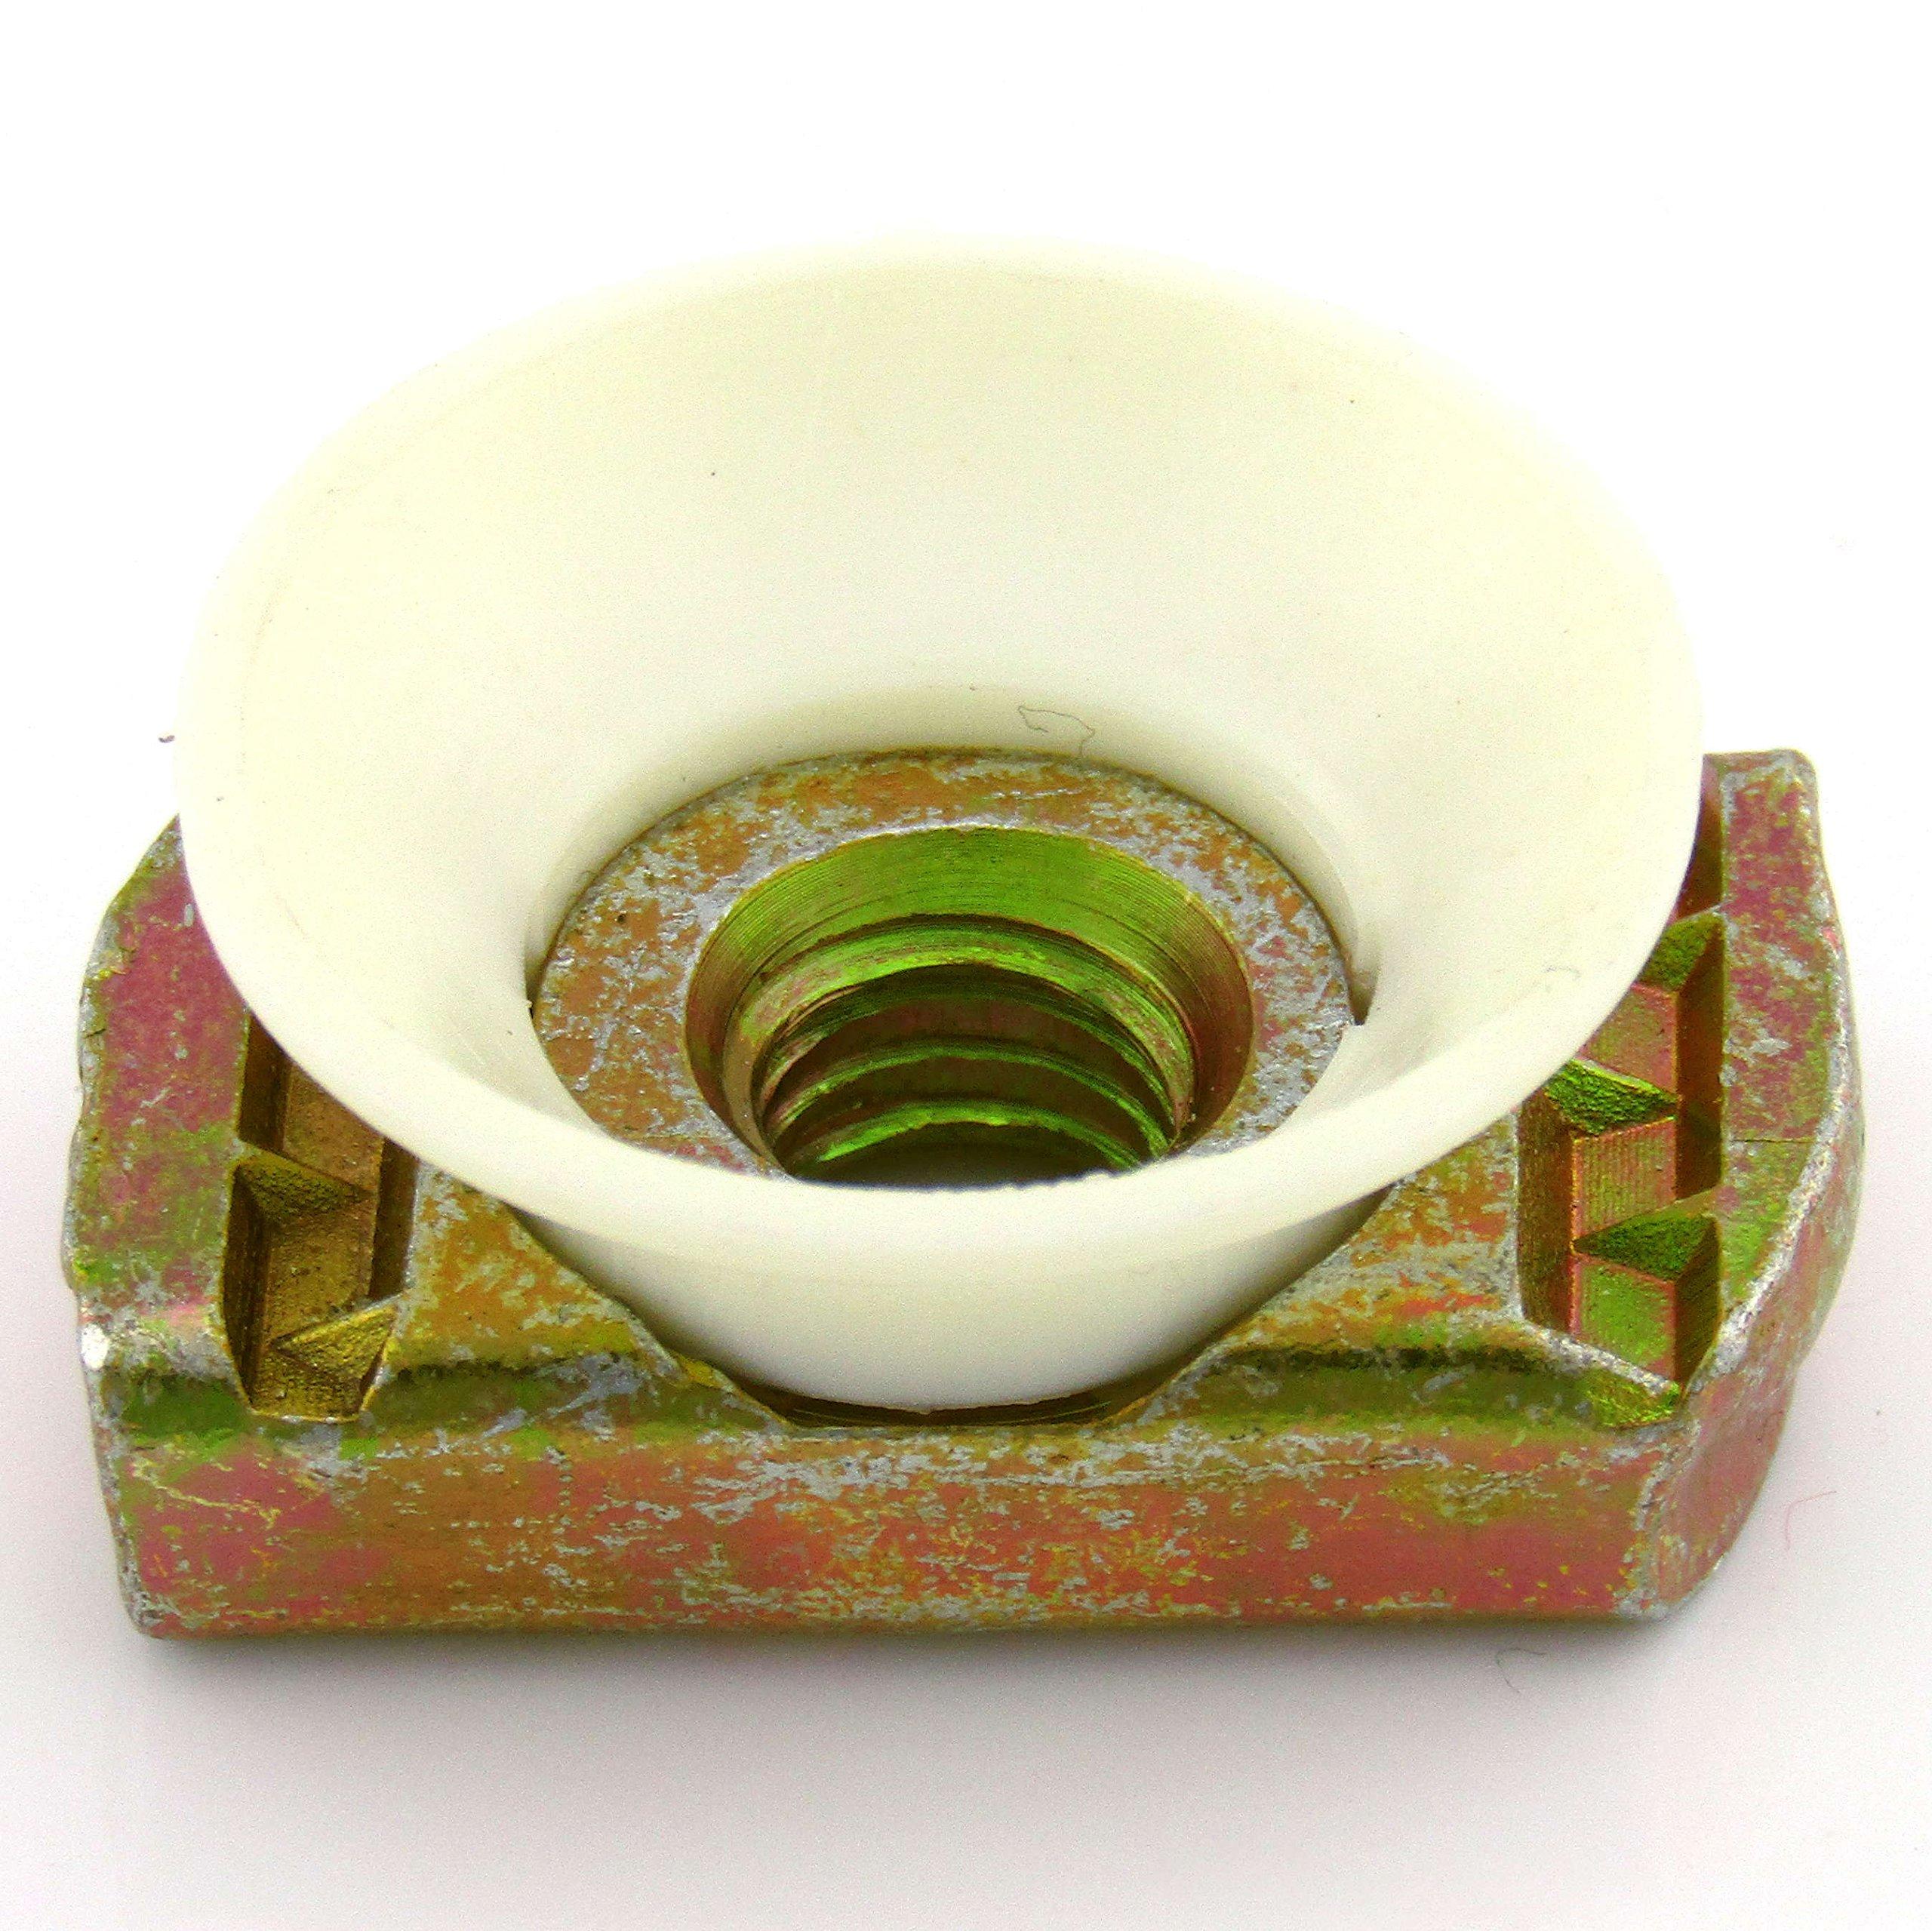 3/8-16 Nylon Cone L/N; Yellow Zinc (100 per box)